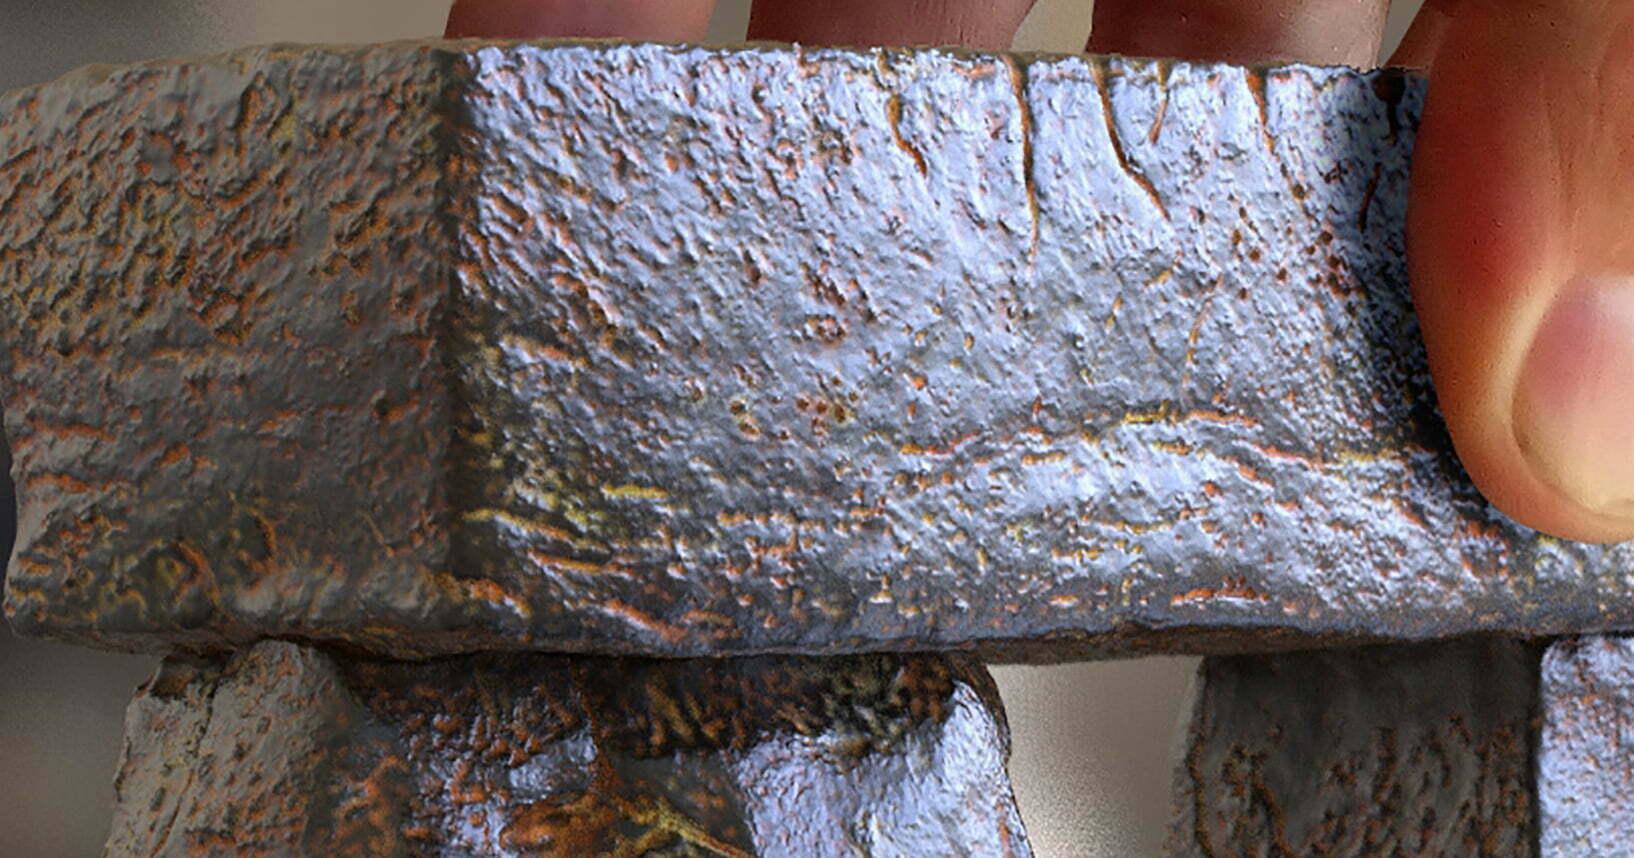 Buy Stonehenge Models: Stonehenge replica model 35th scale full set light rust patina cropped 01  - Close up of Trilithon Two, Stonehenge replica model - Close up of Trilithon Two, Stonehenge replica model